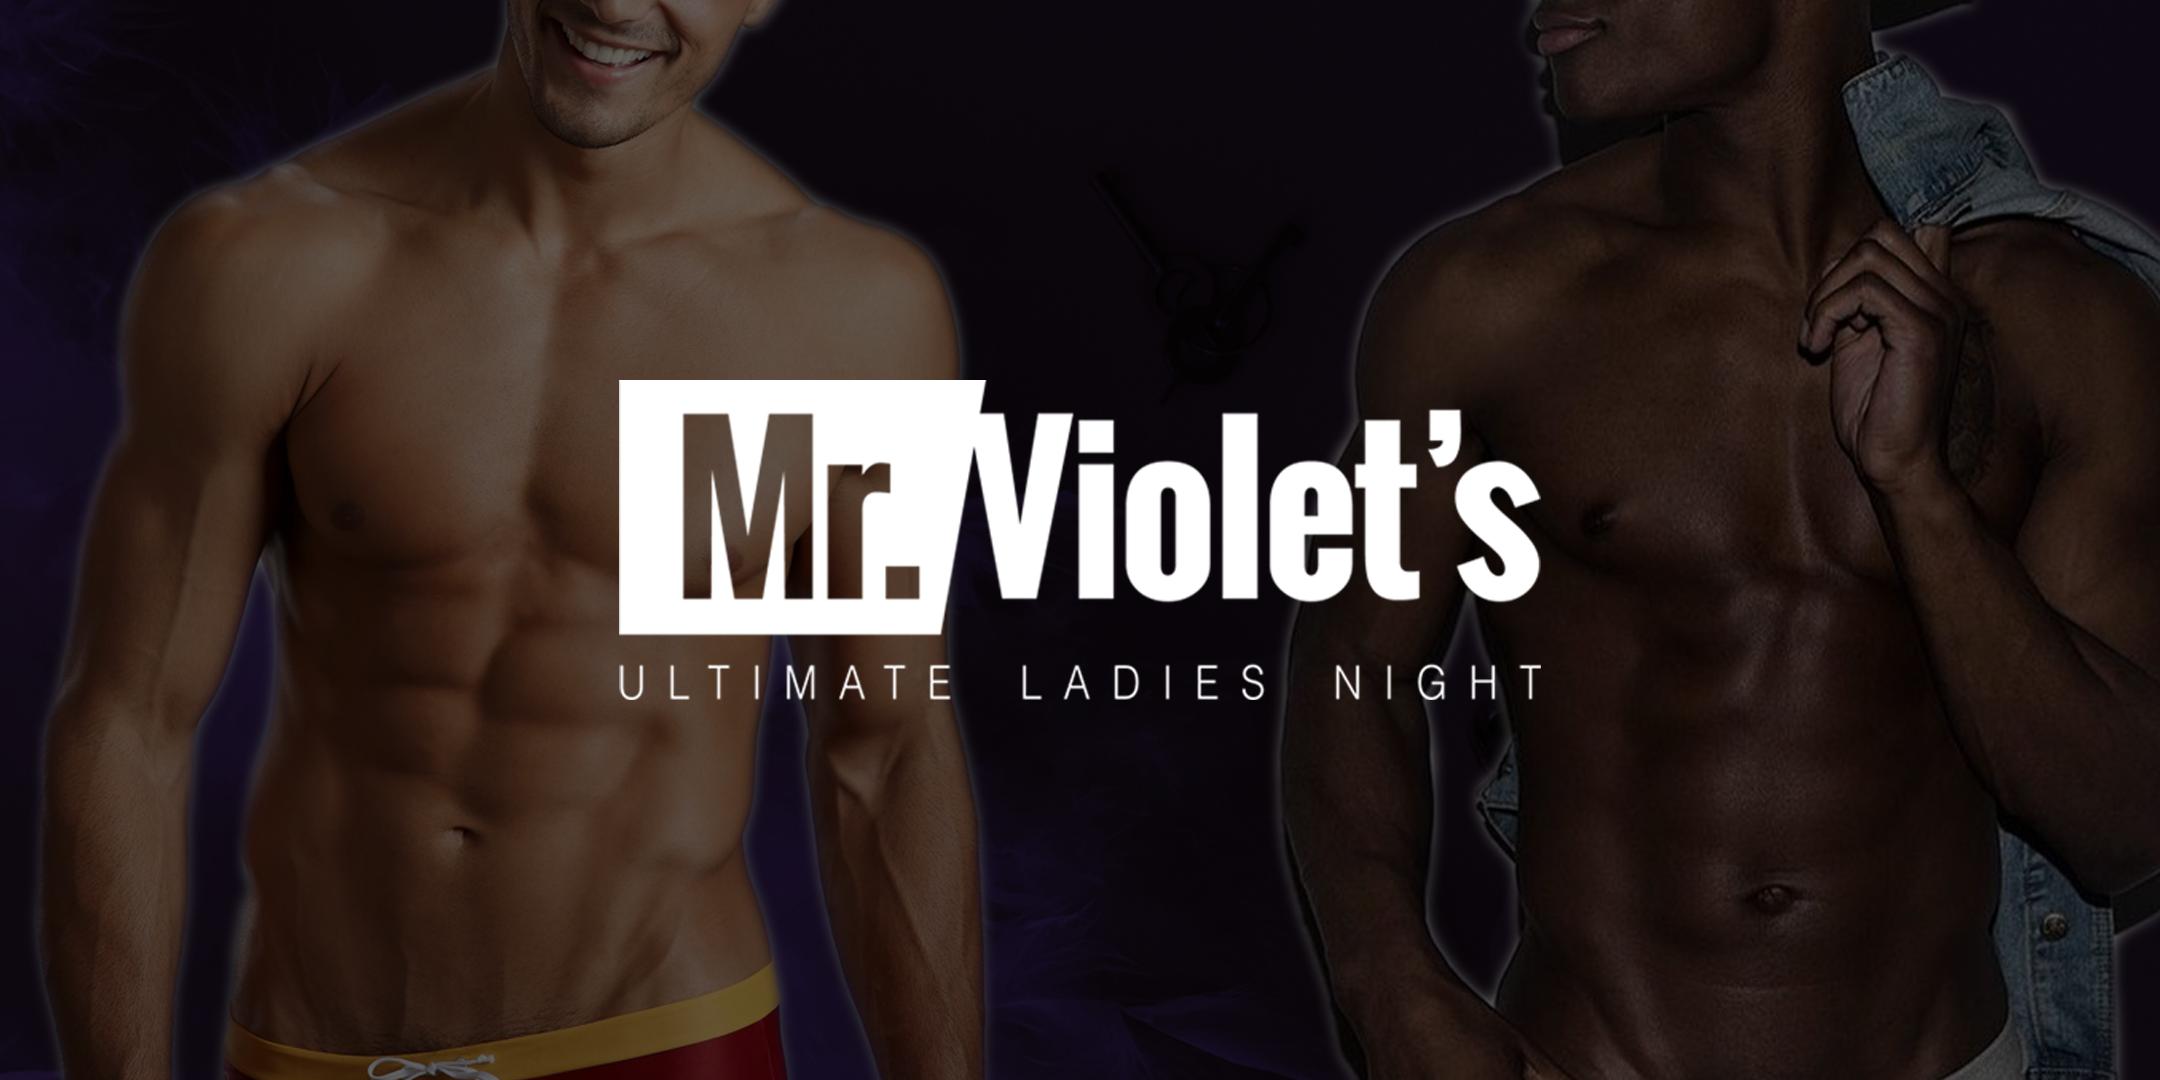 mr. violet's ultimate ladies night @ the apartment, chicago - 20